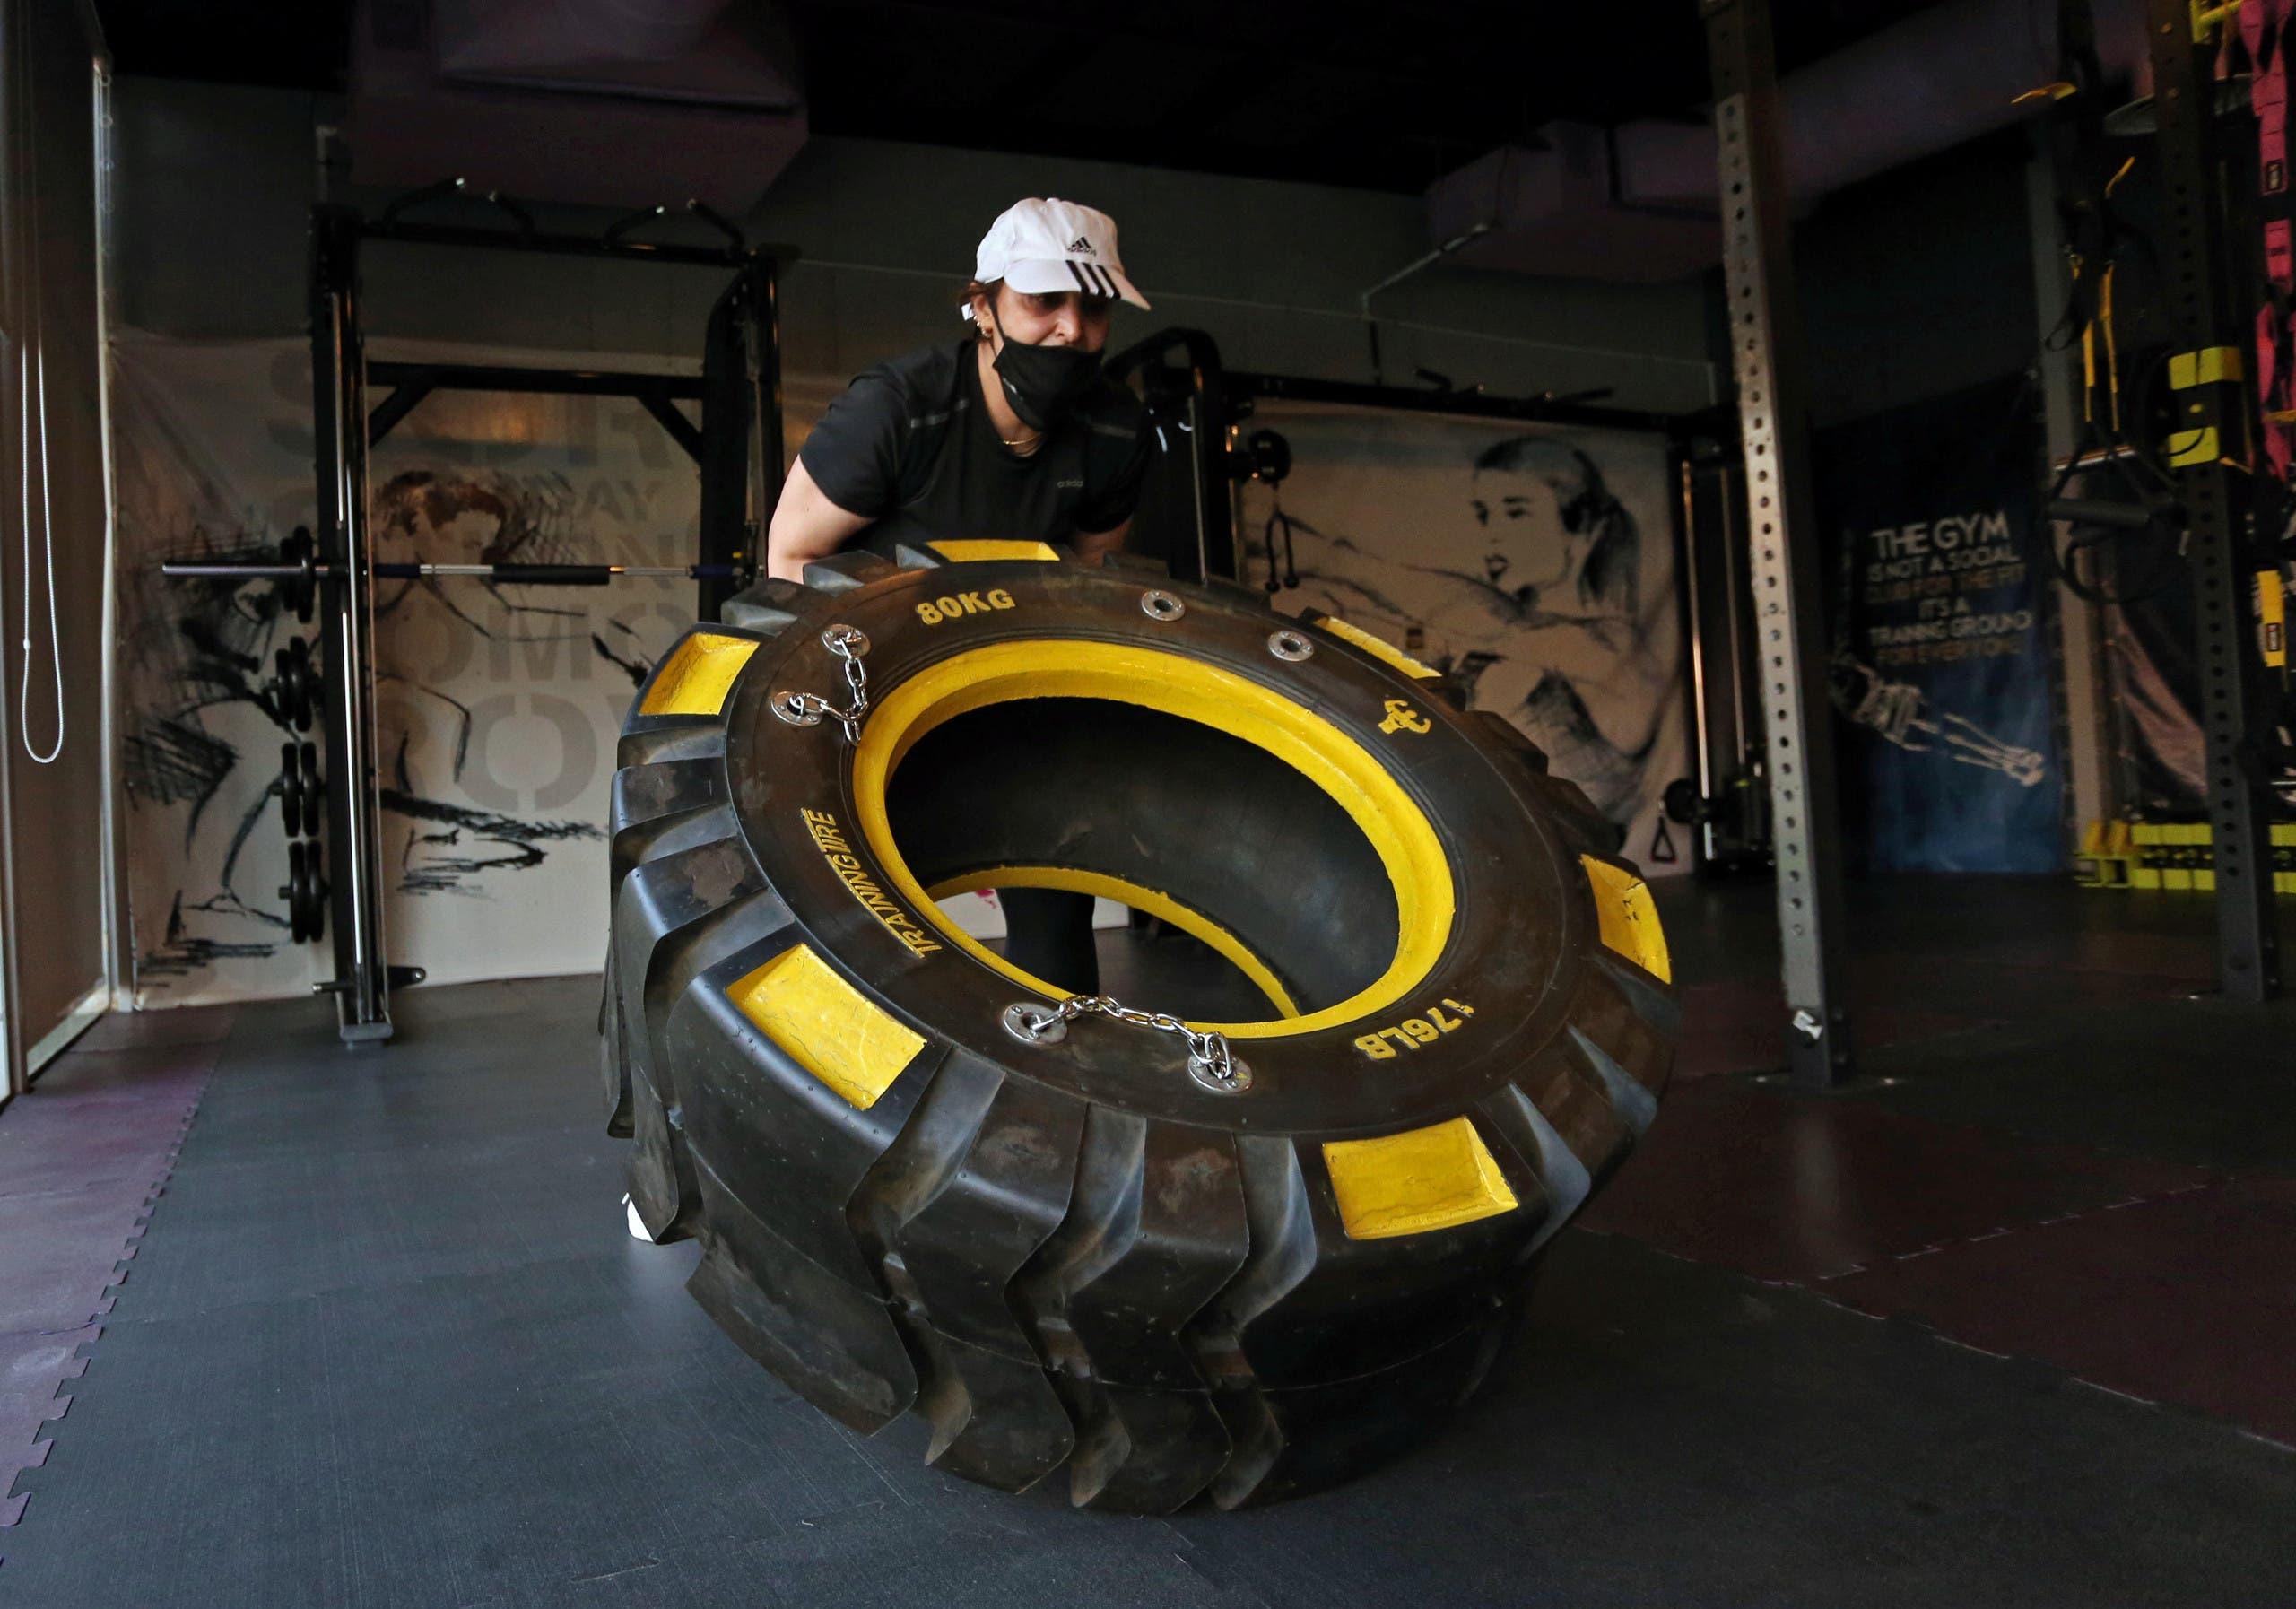 A woman works out at a gym, amid the spread of the coronavirus disease (COVID-19), in Riyadh, Saudi Arabia. (Reuters)